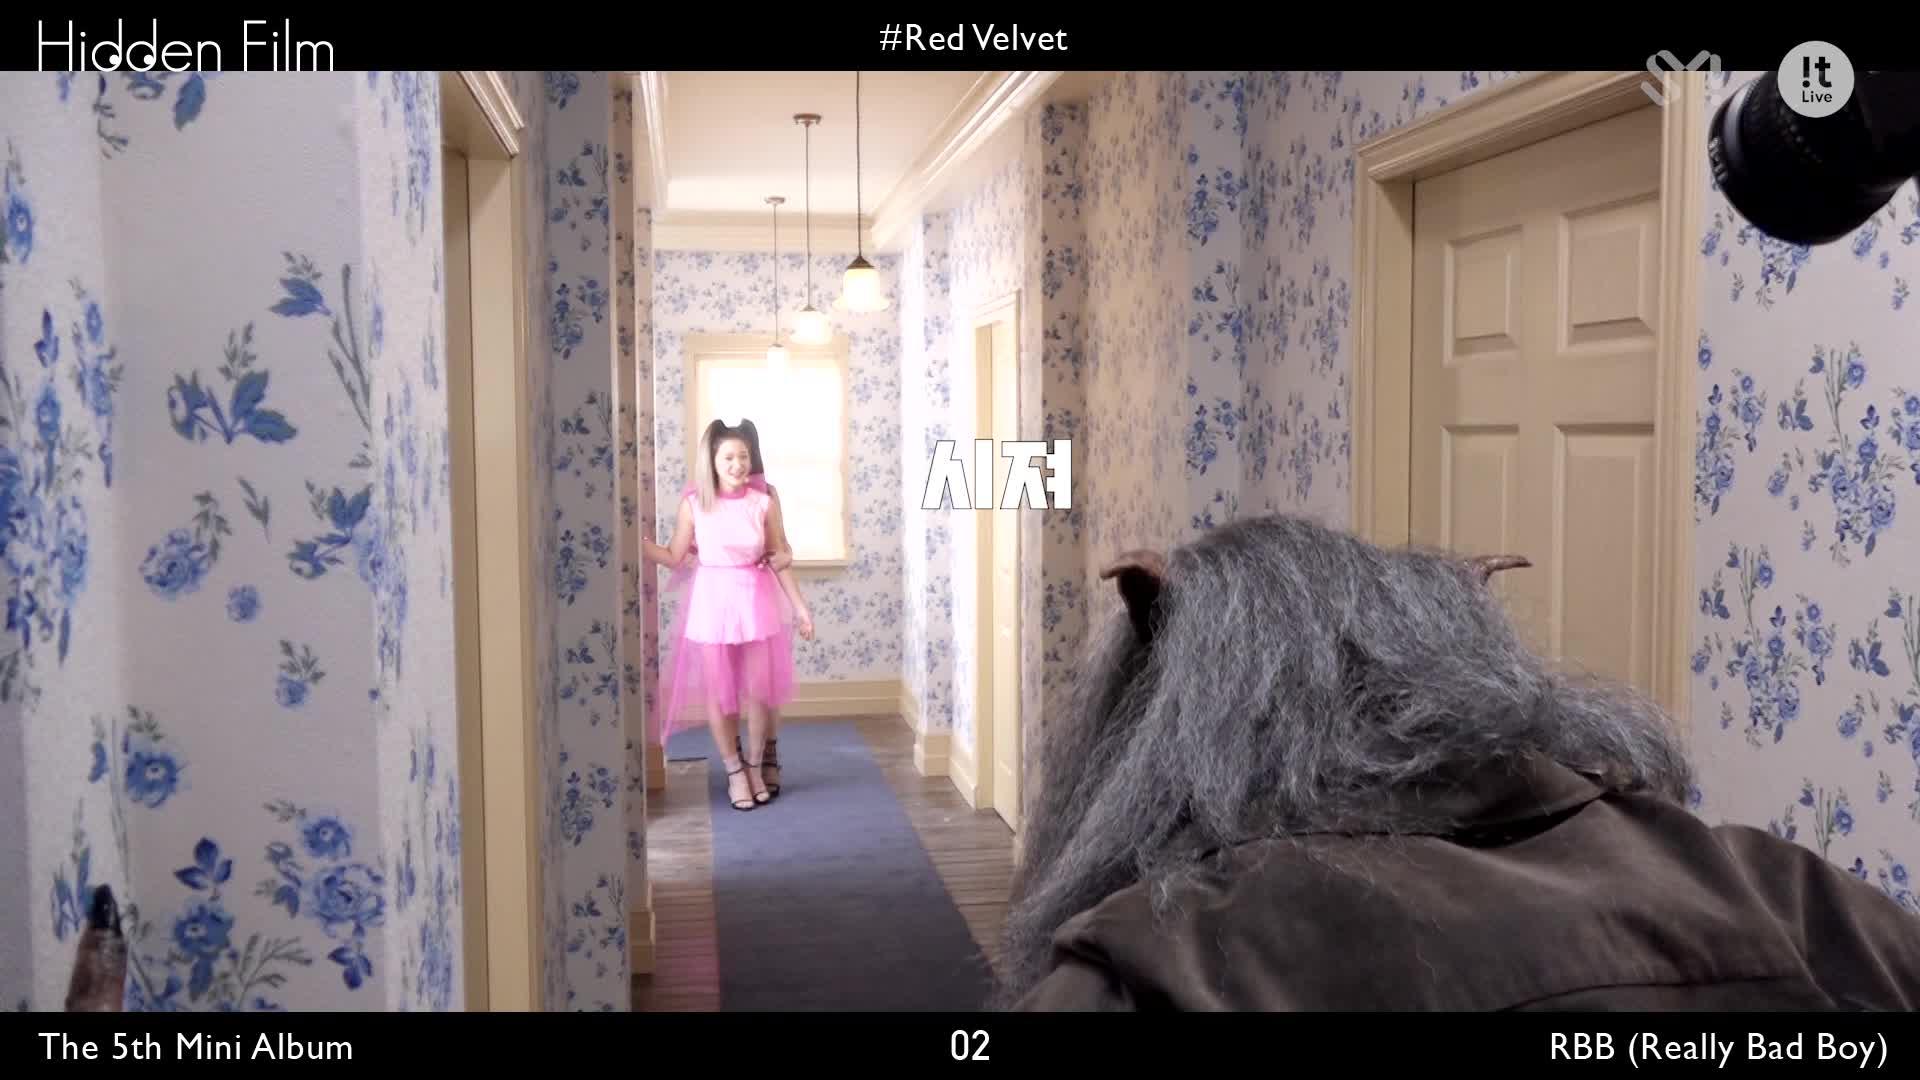 Hidden Film 히든필름_Red Velvet 레드벨벳 'RBB (Really Bad Boy)'